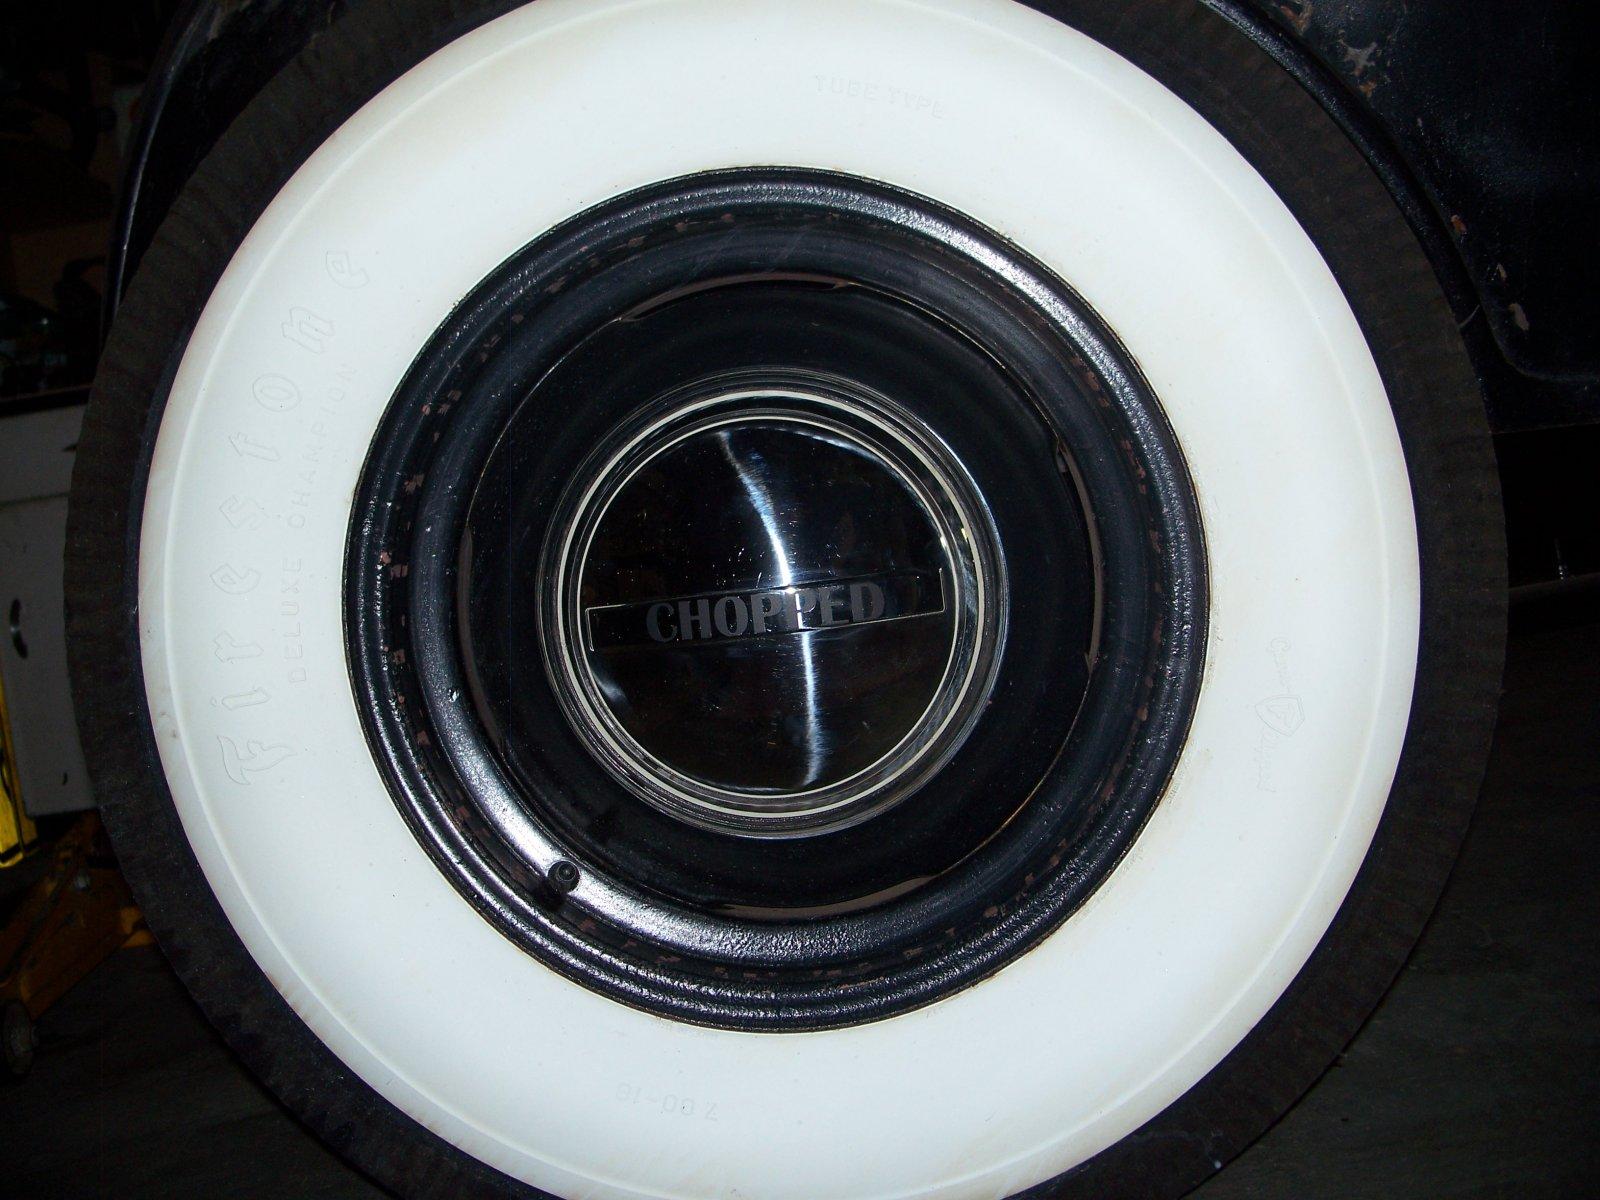 CHOPPED hub caps 006.JPG